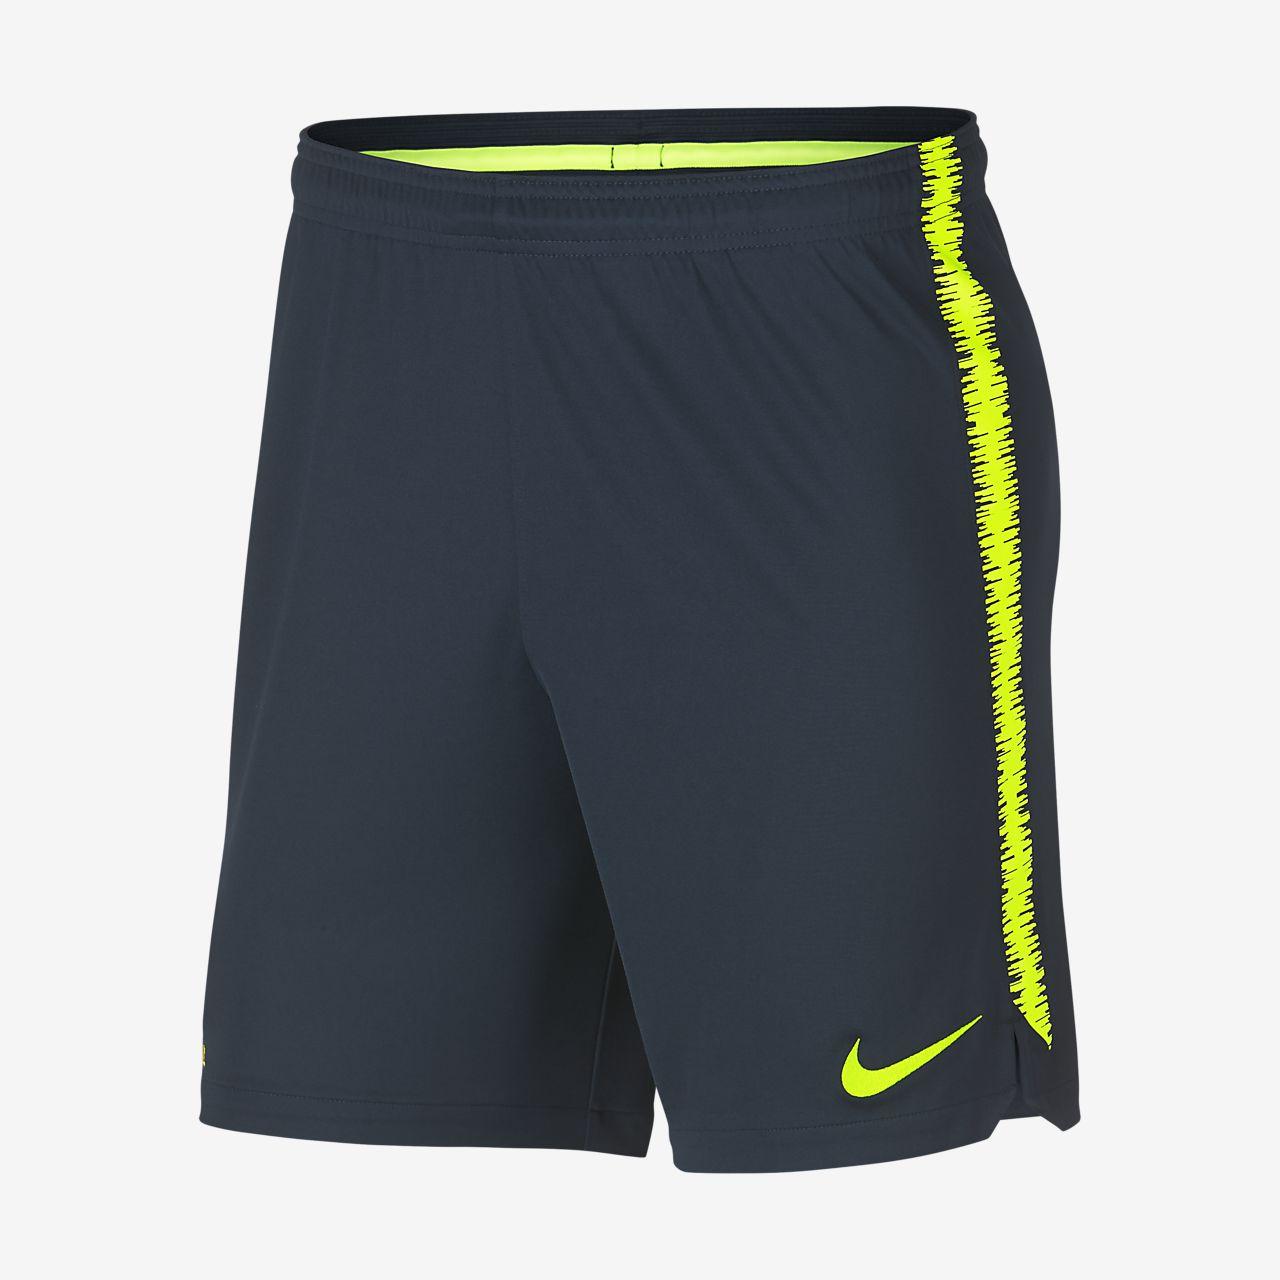 Brasil CBF Dri-FIT Squad Pantalón corto de fútbol - Hombre. Nike.com ES 6966a316ccc